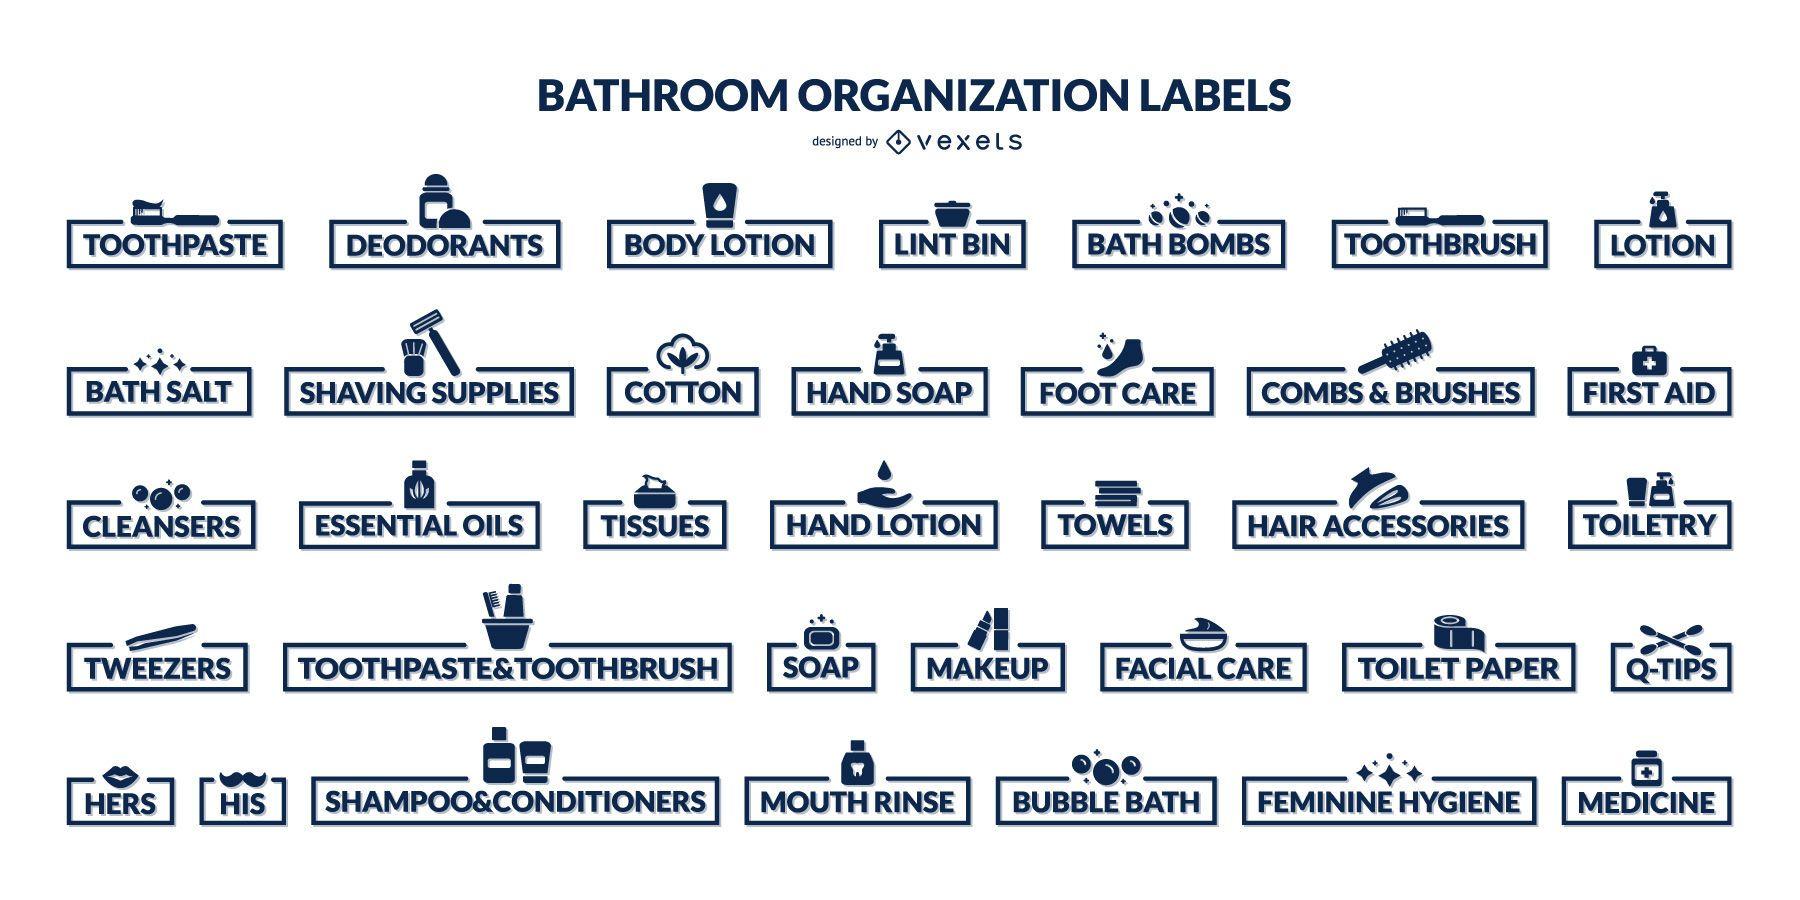 Bathroom organization labels set